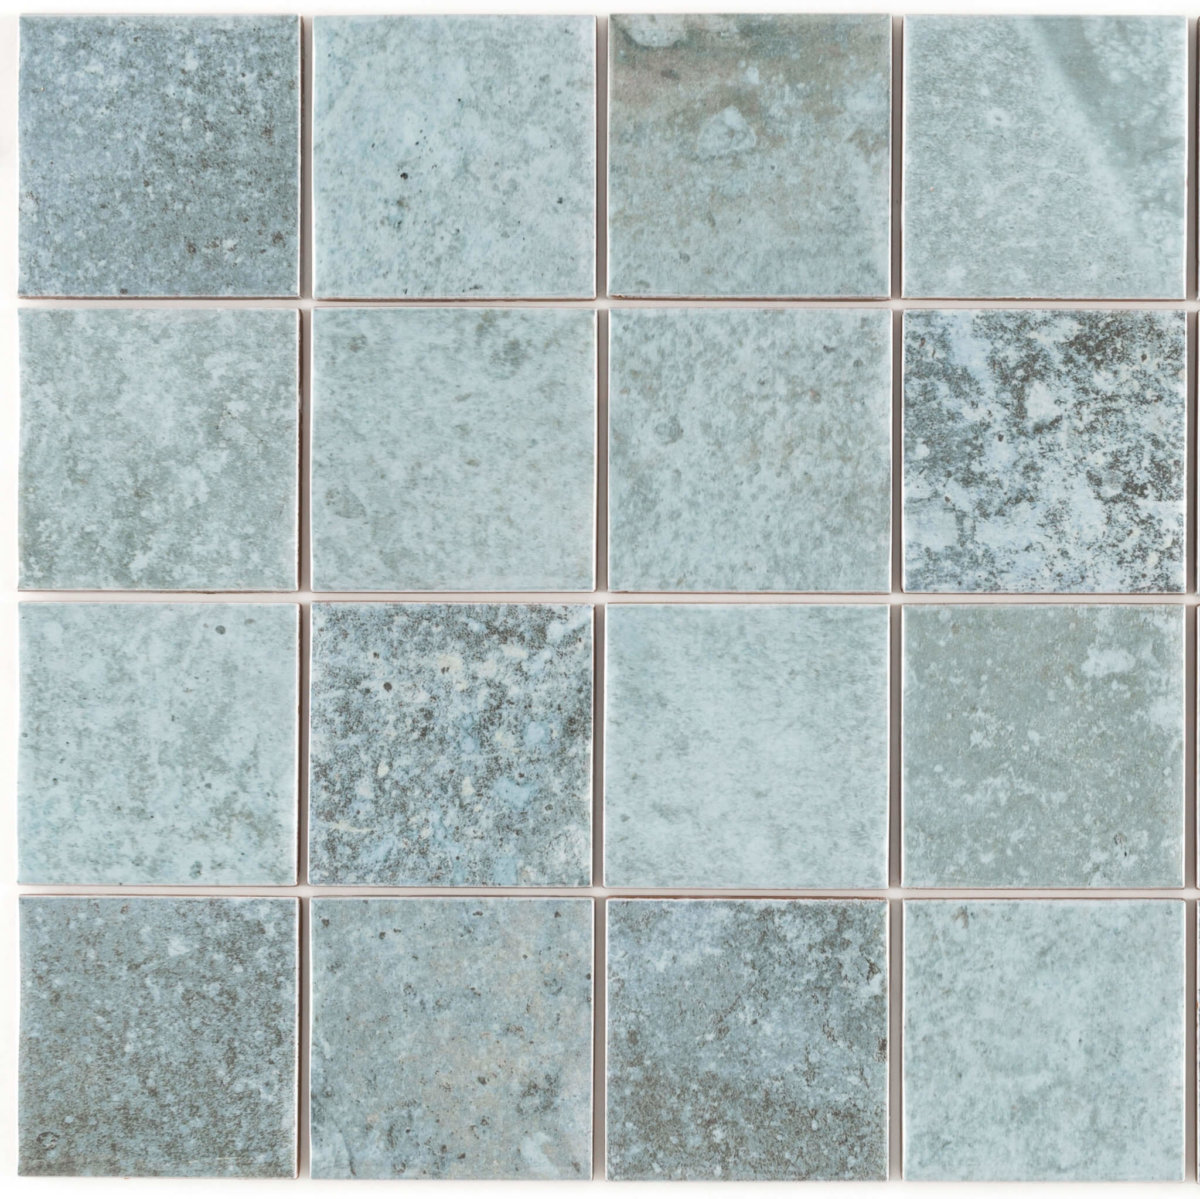 Eli Java Mar Mesh Br 75x75mm Green_Stiles_Product7_Image